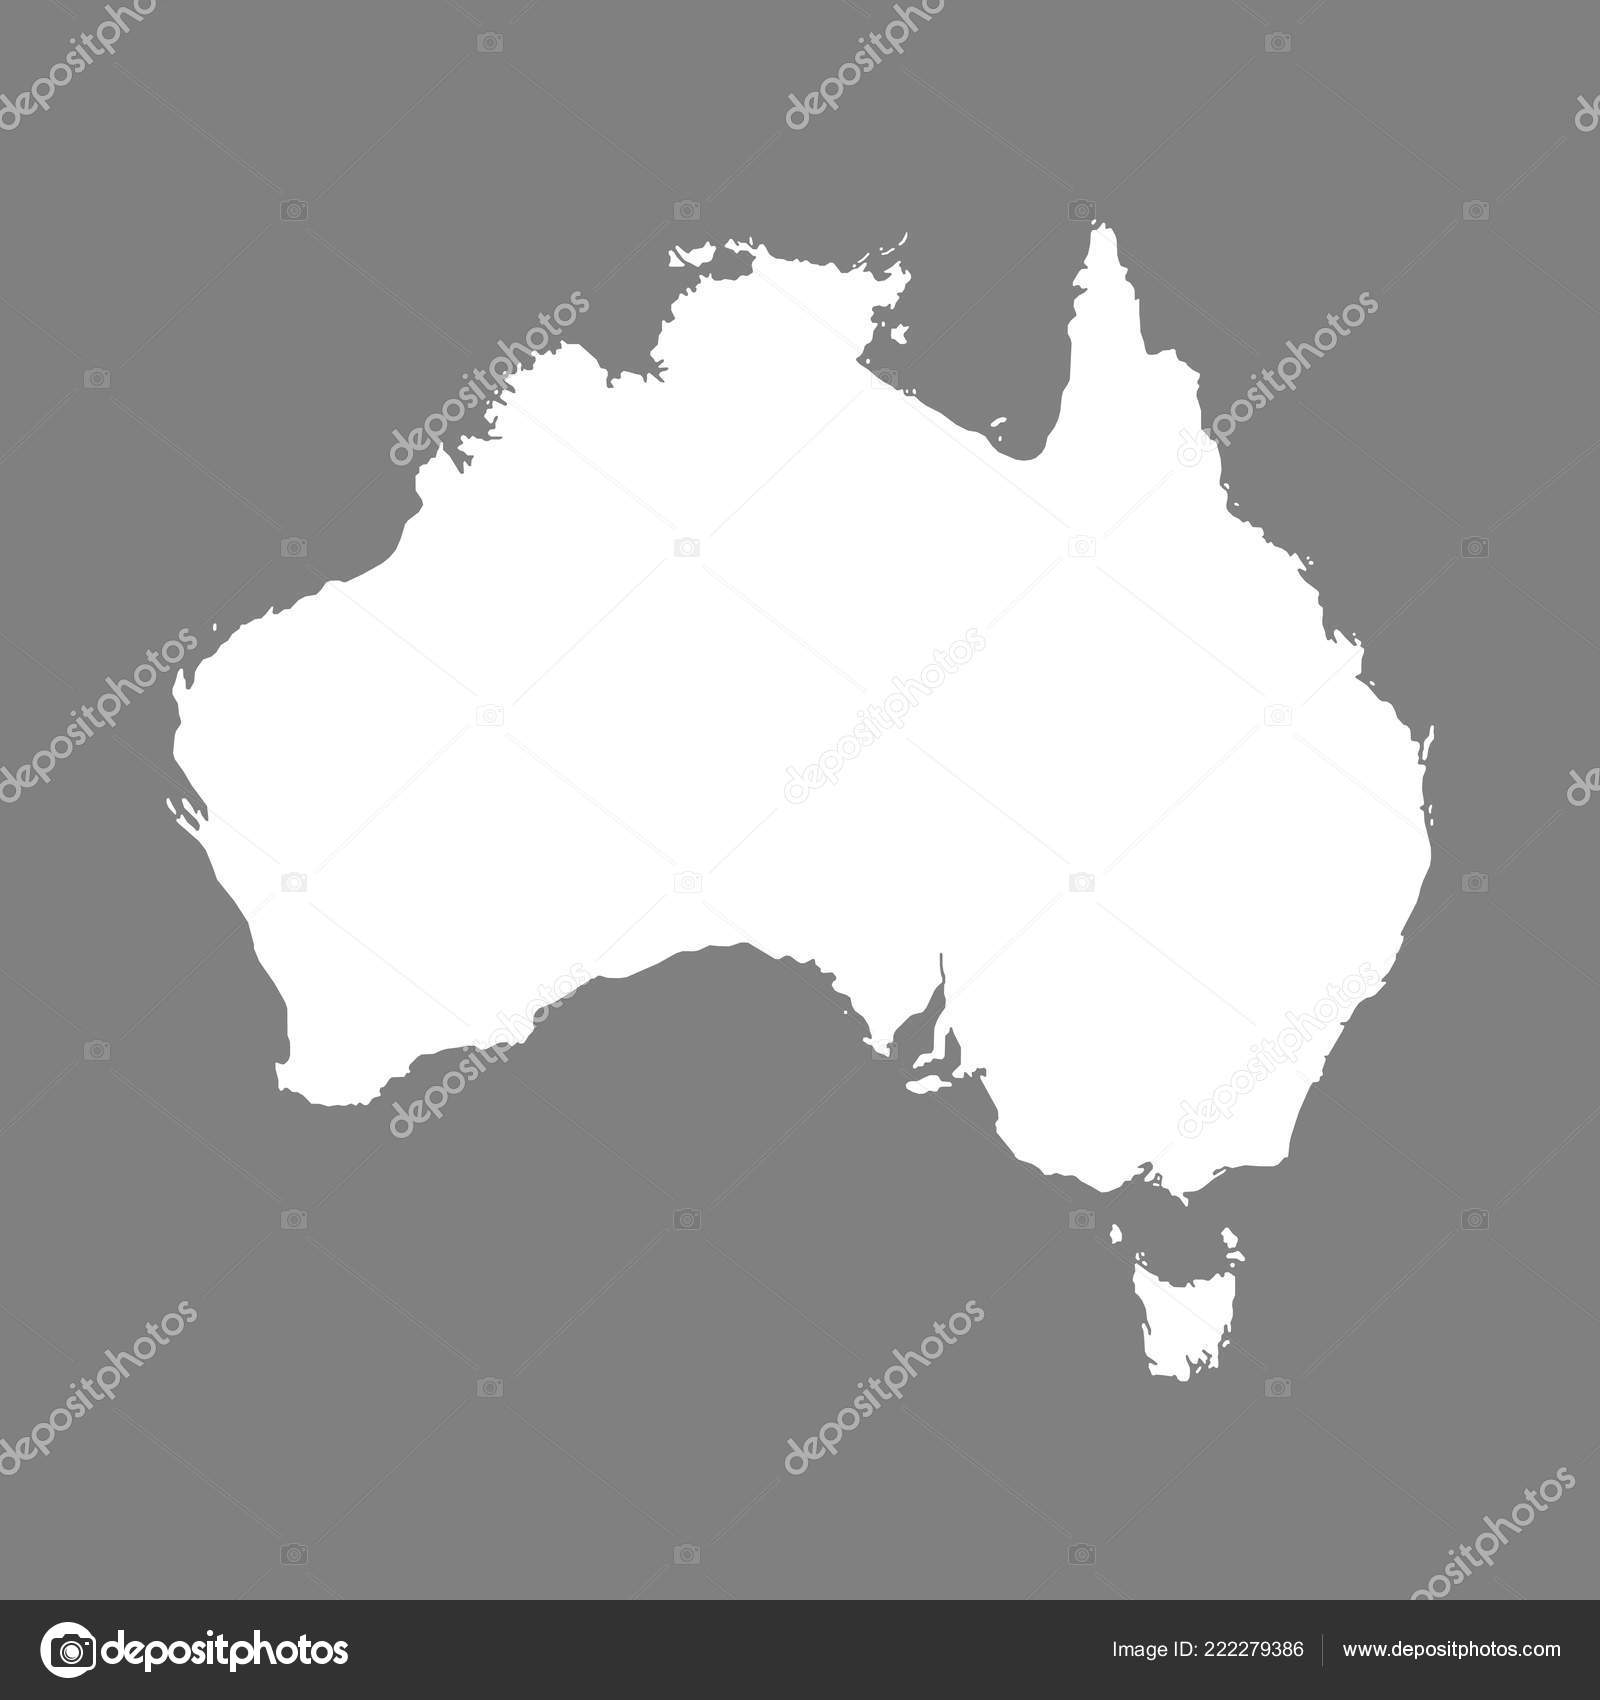 Australia Map Grey.Isolated White Blank Australia Map Grey Background Flat Vector